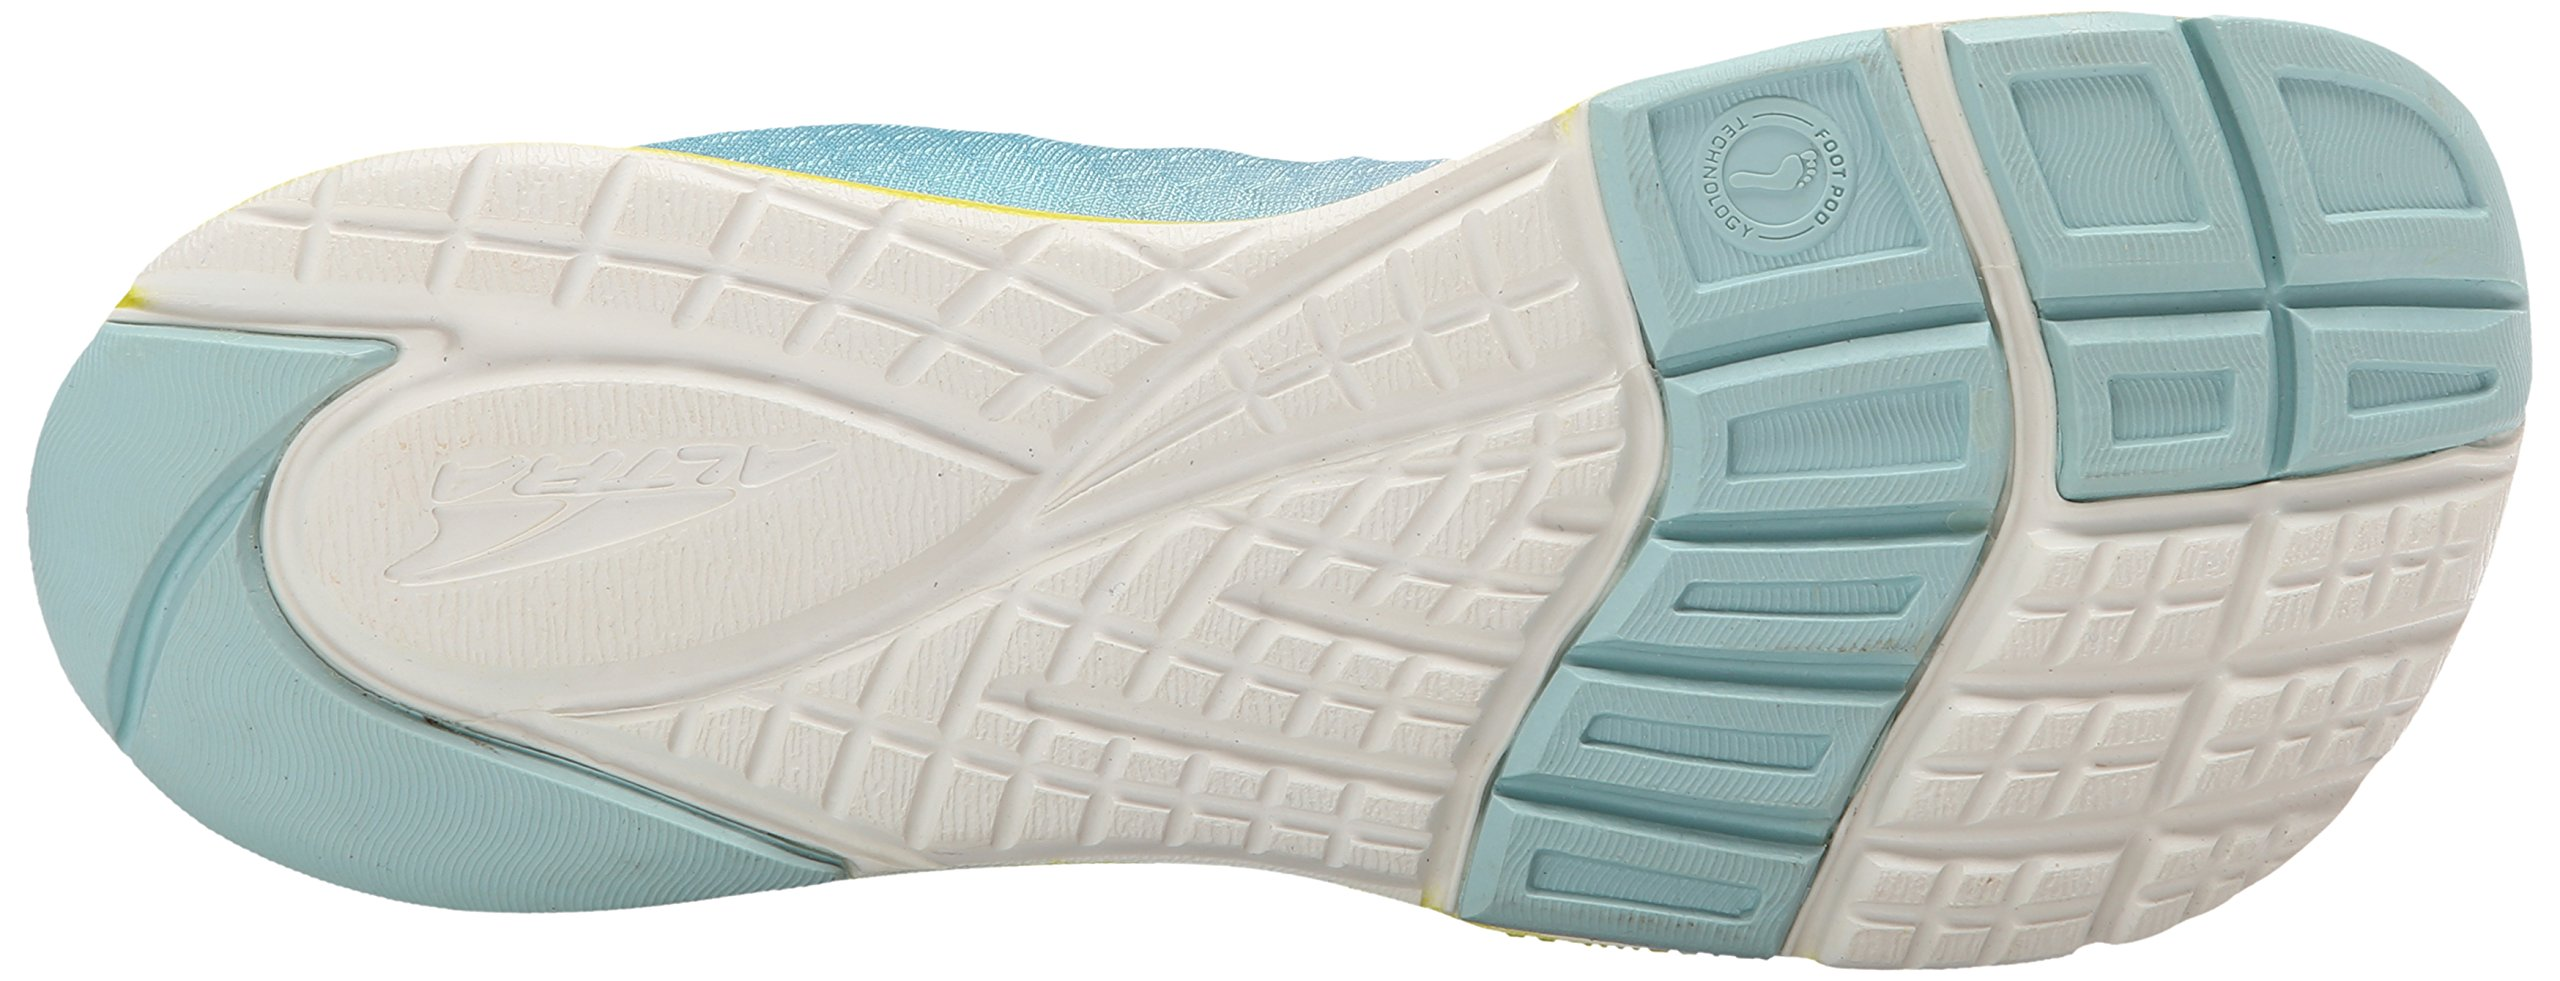 81BXdx7WktL - Altra Women's Impulse Running Shoe